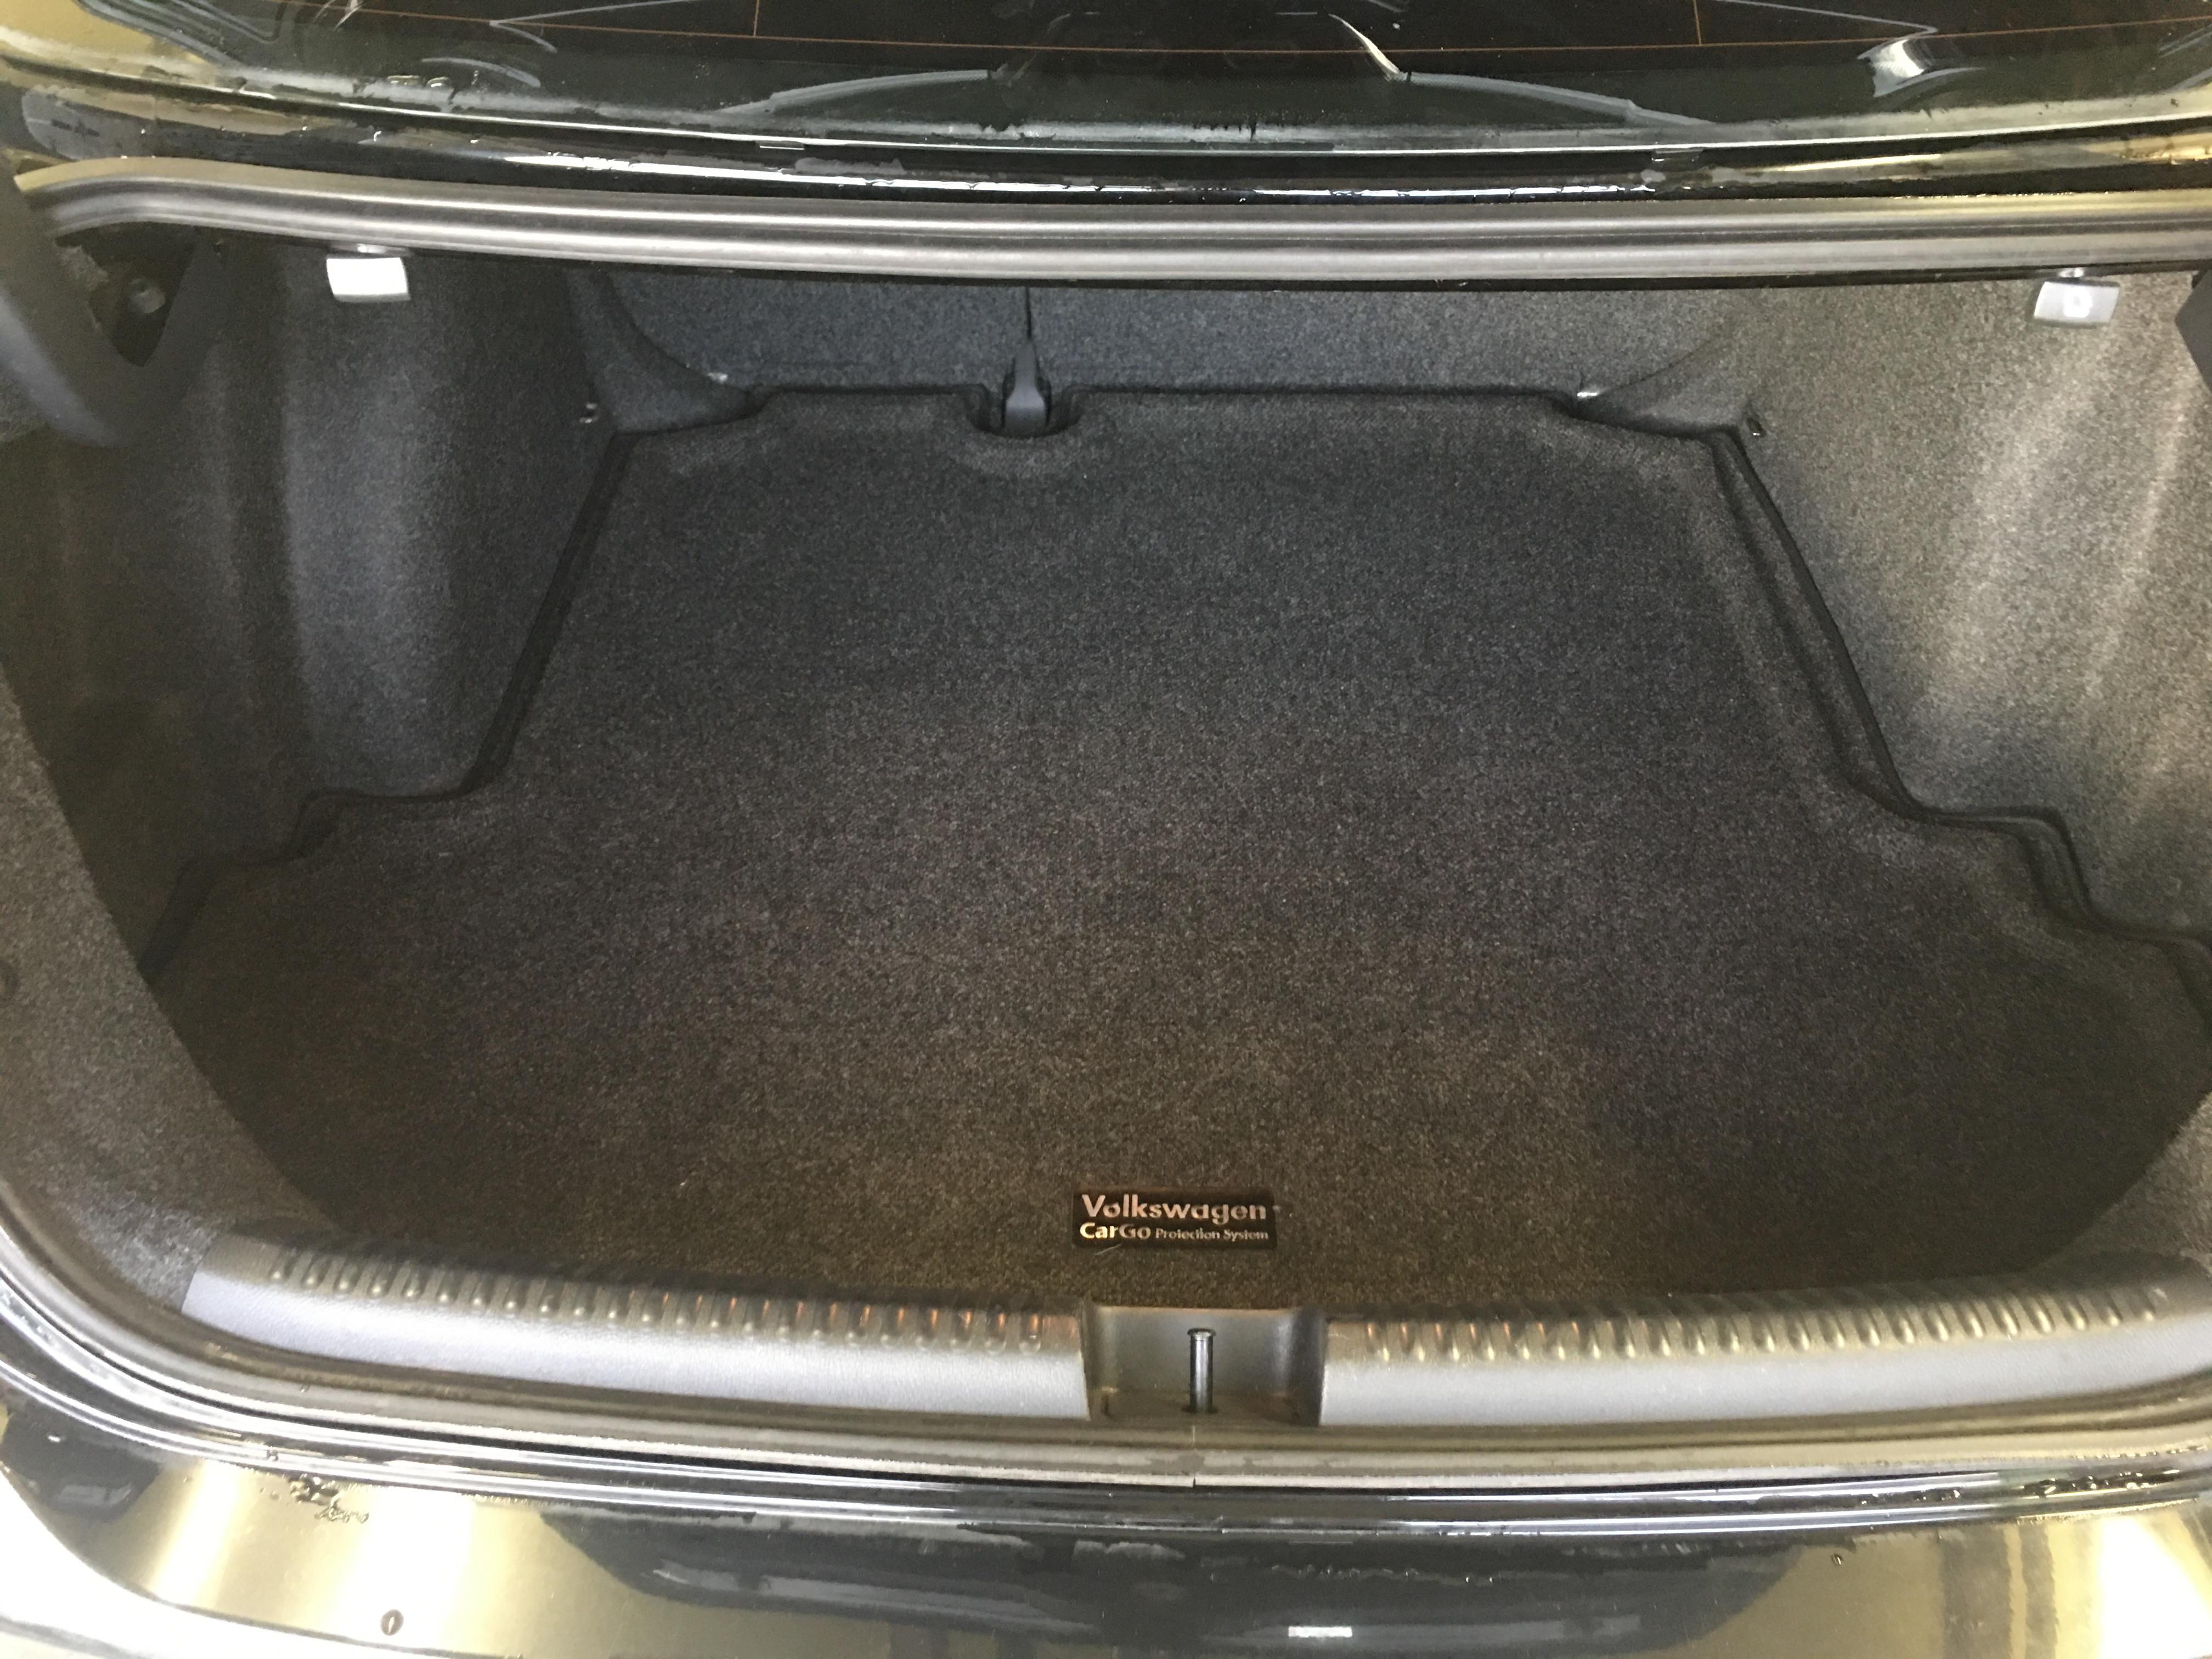 2013 Volkswagen Jetta TDI_6728